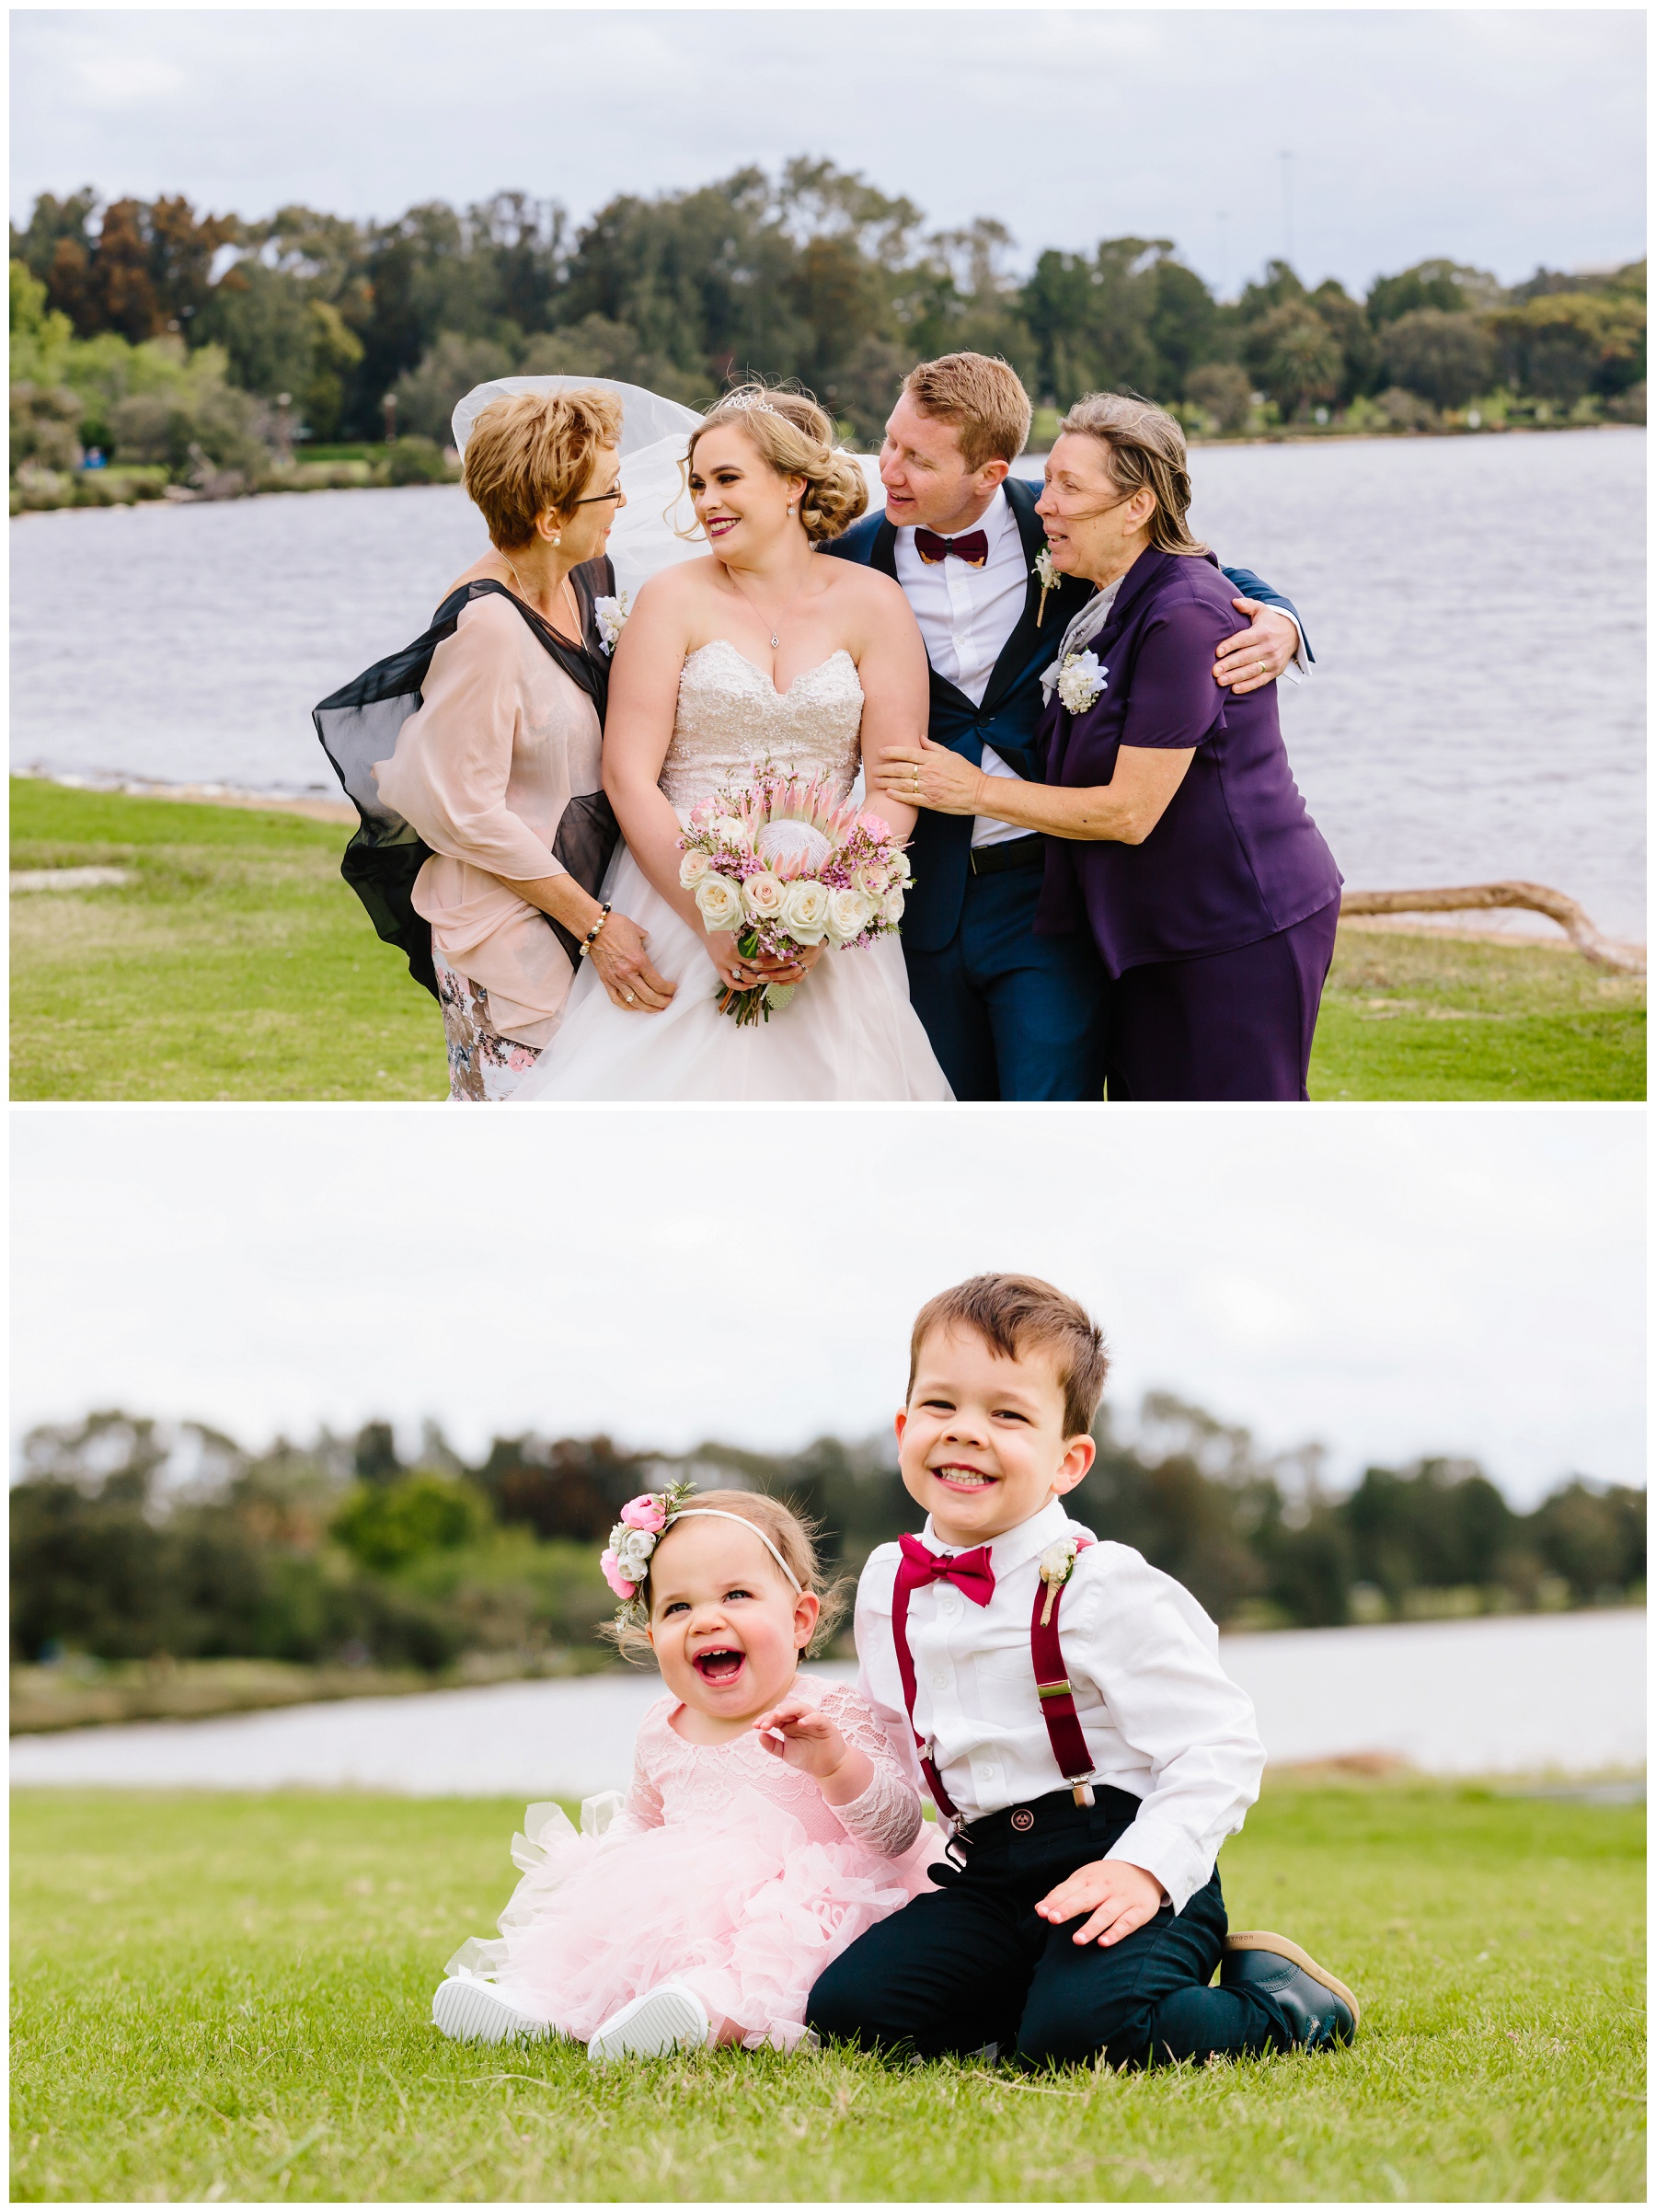 family photos at weddings